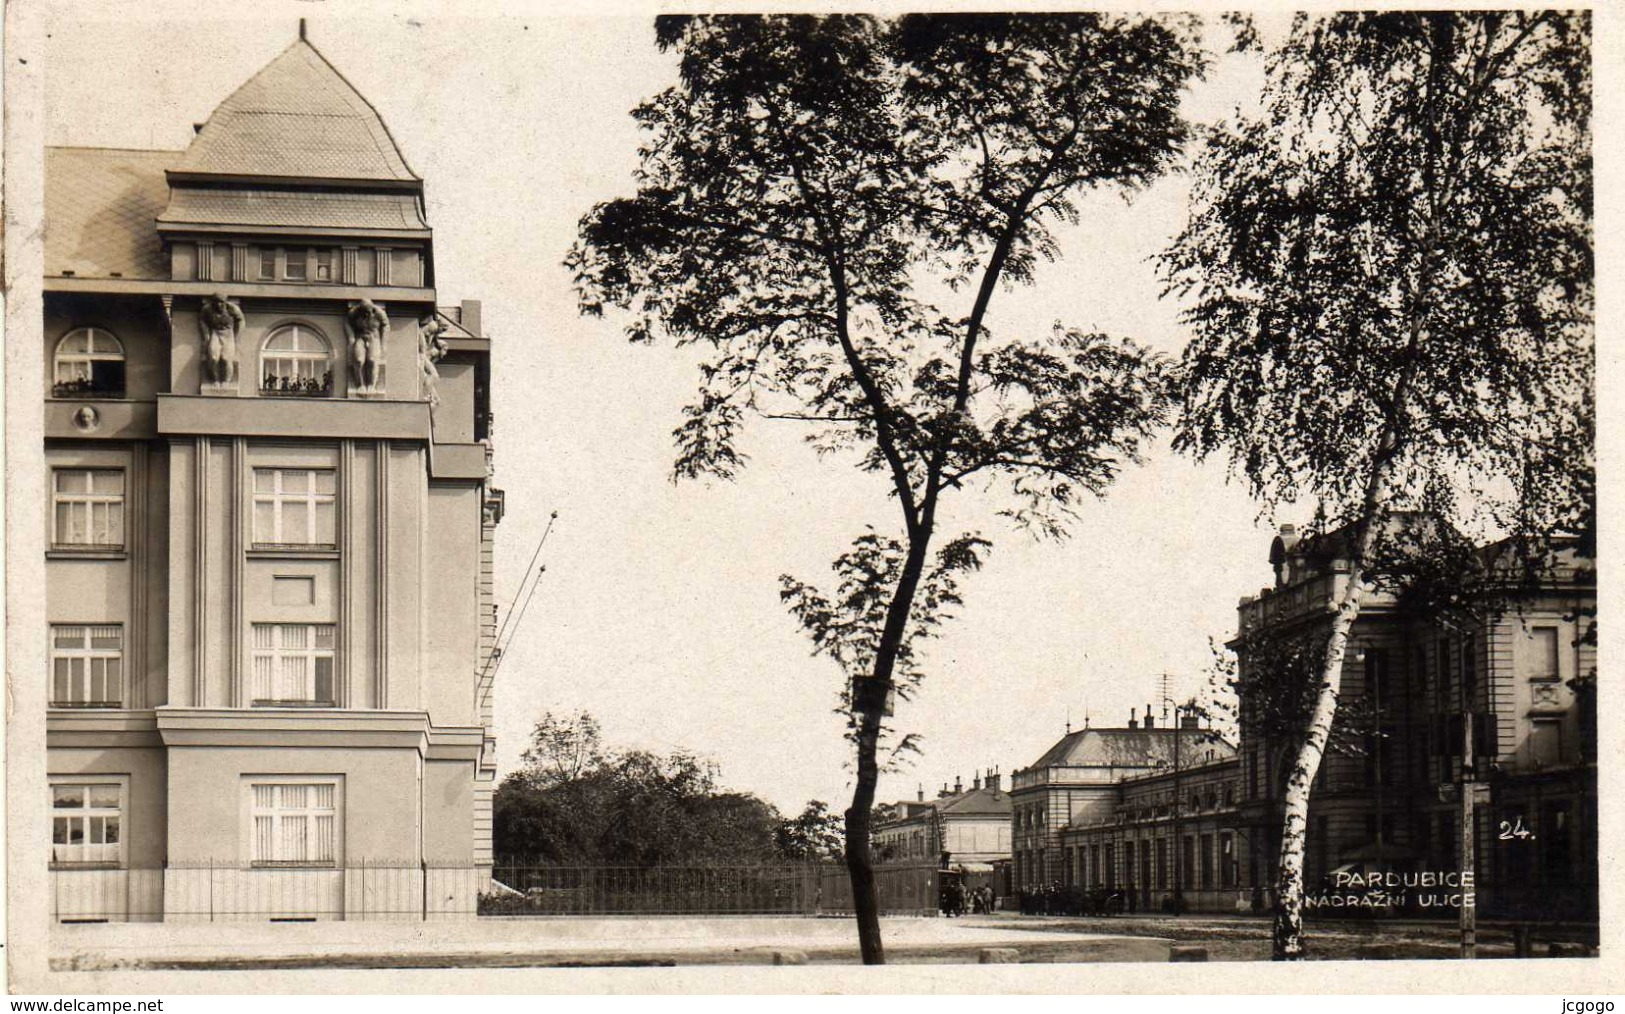 CZECH REPUBLIC  PARDUBICE NADRAZNI ULICE  1925 - Tchéquie